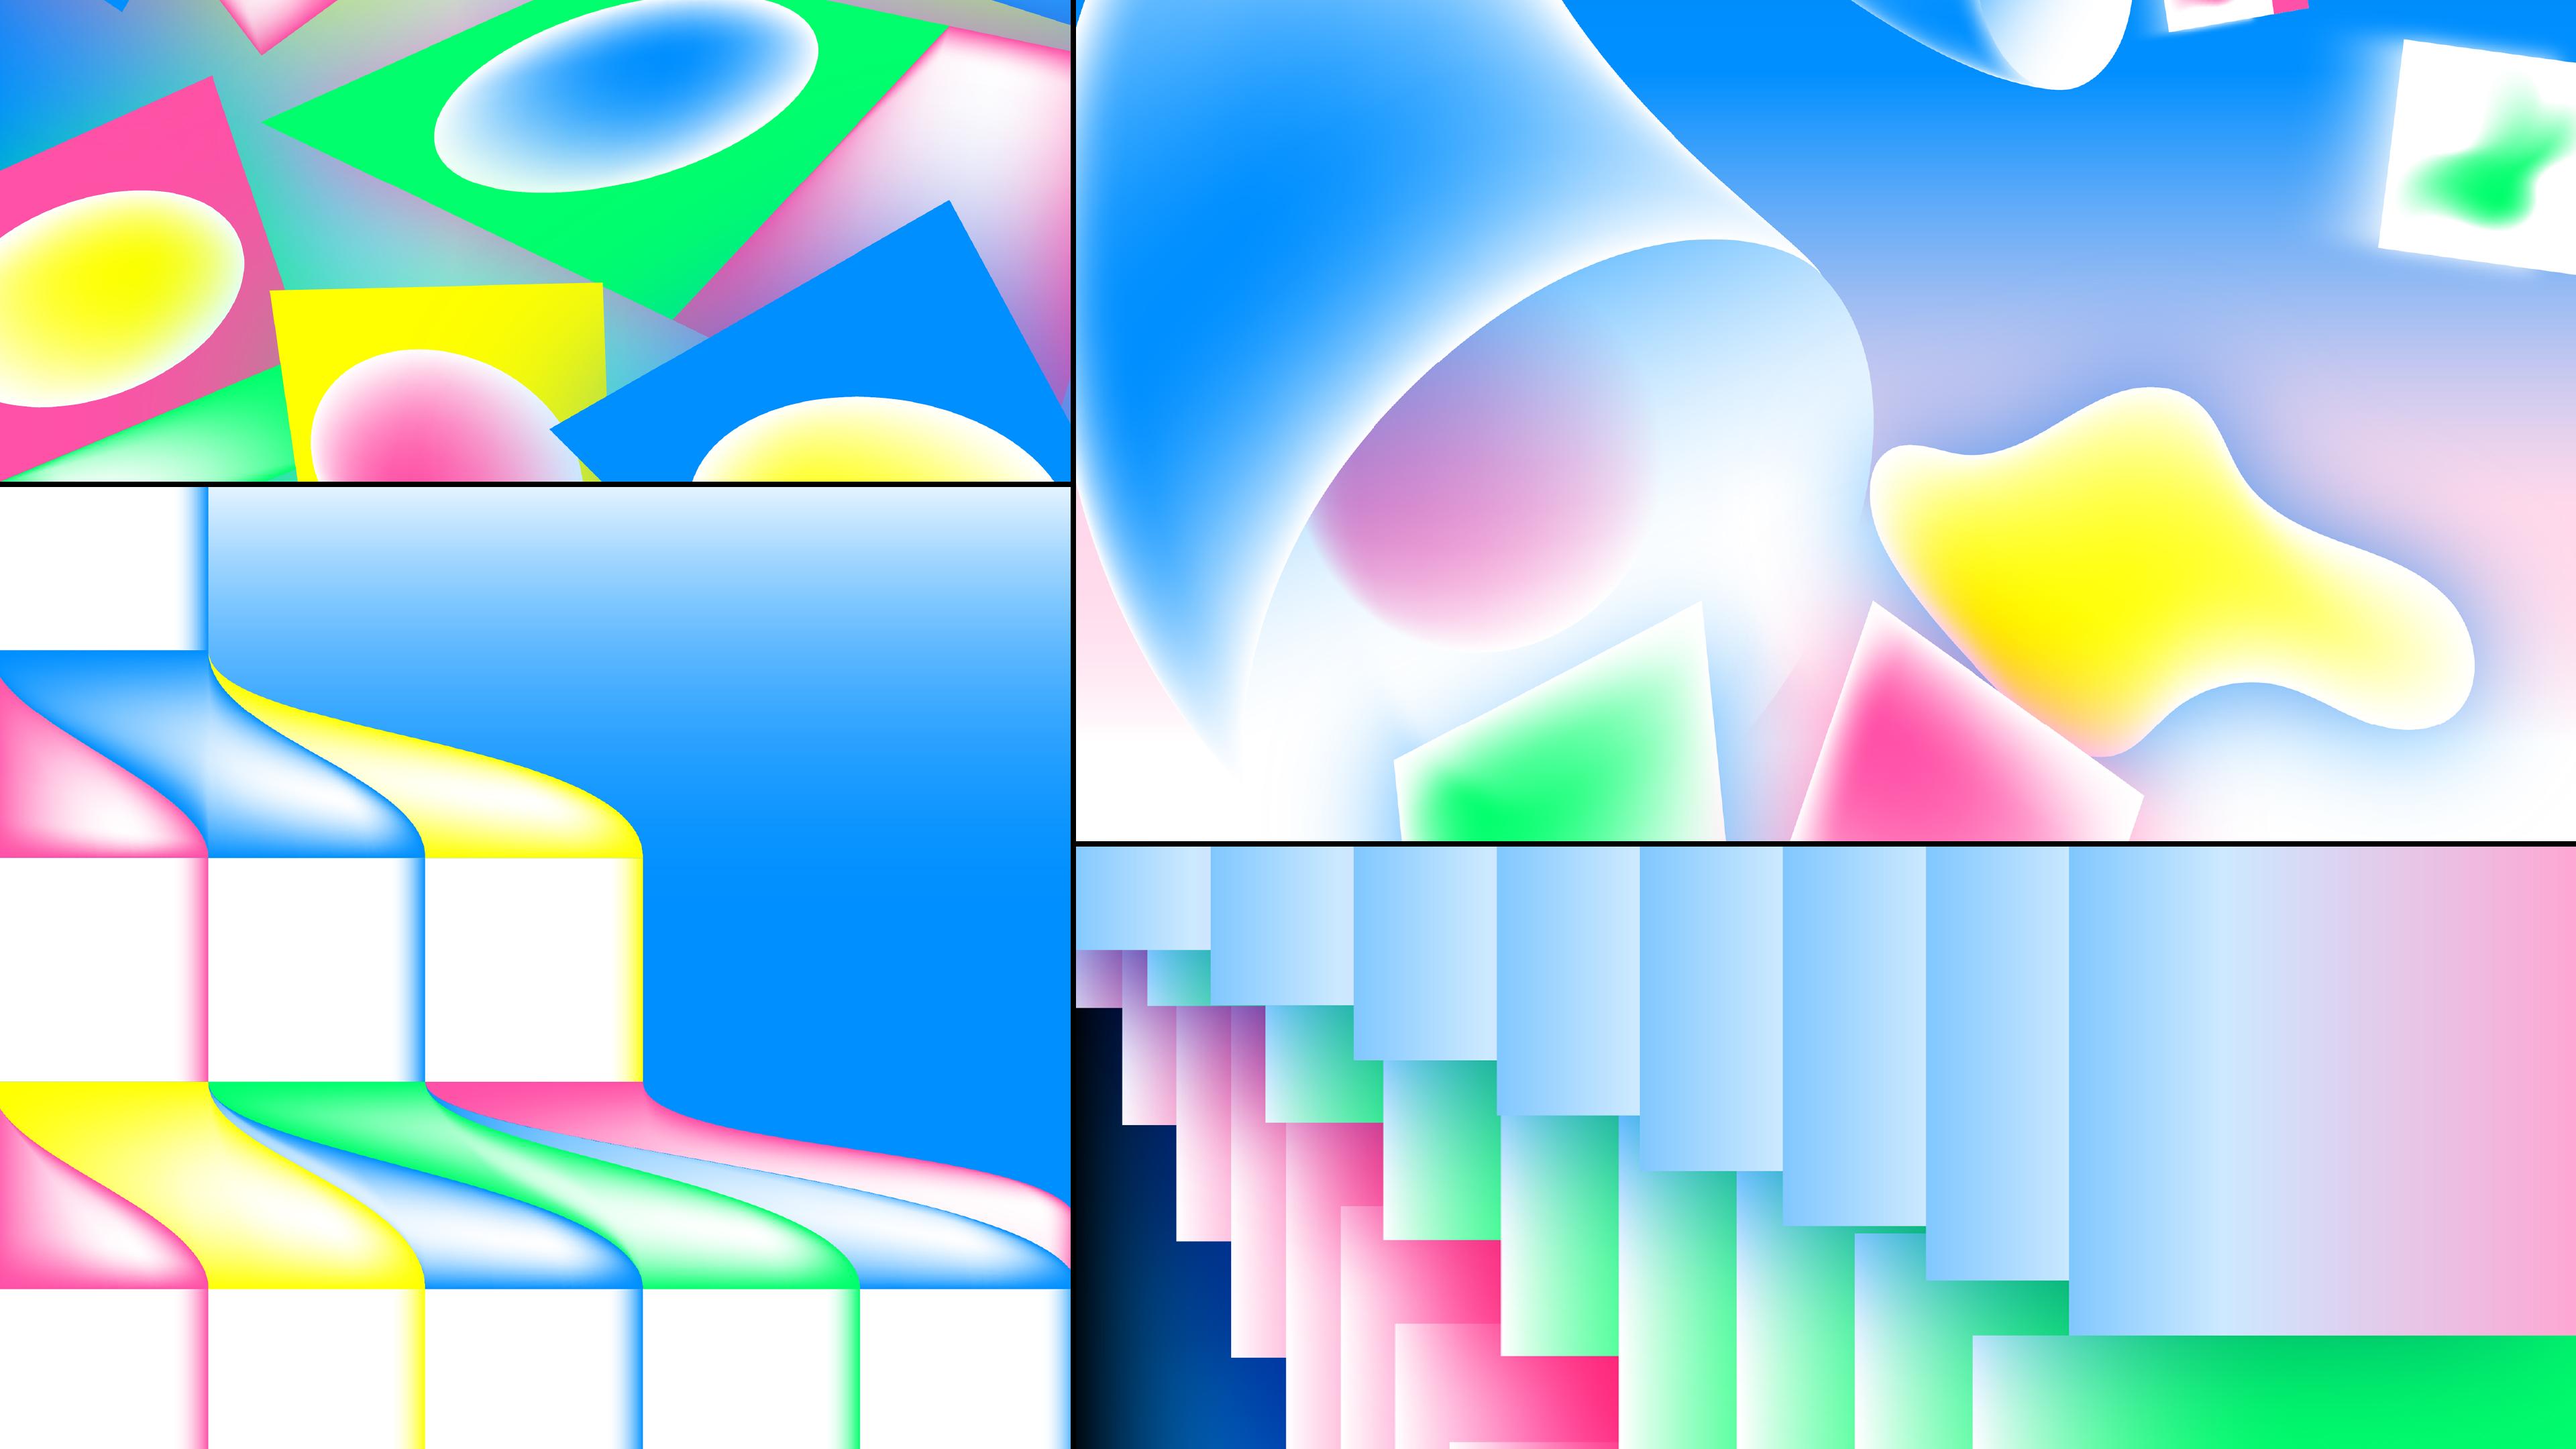 Graphics designed for Celtra.